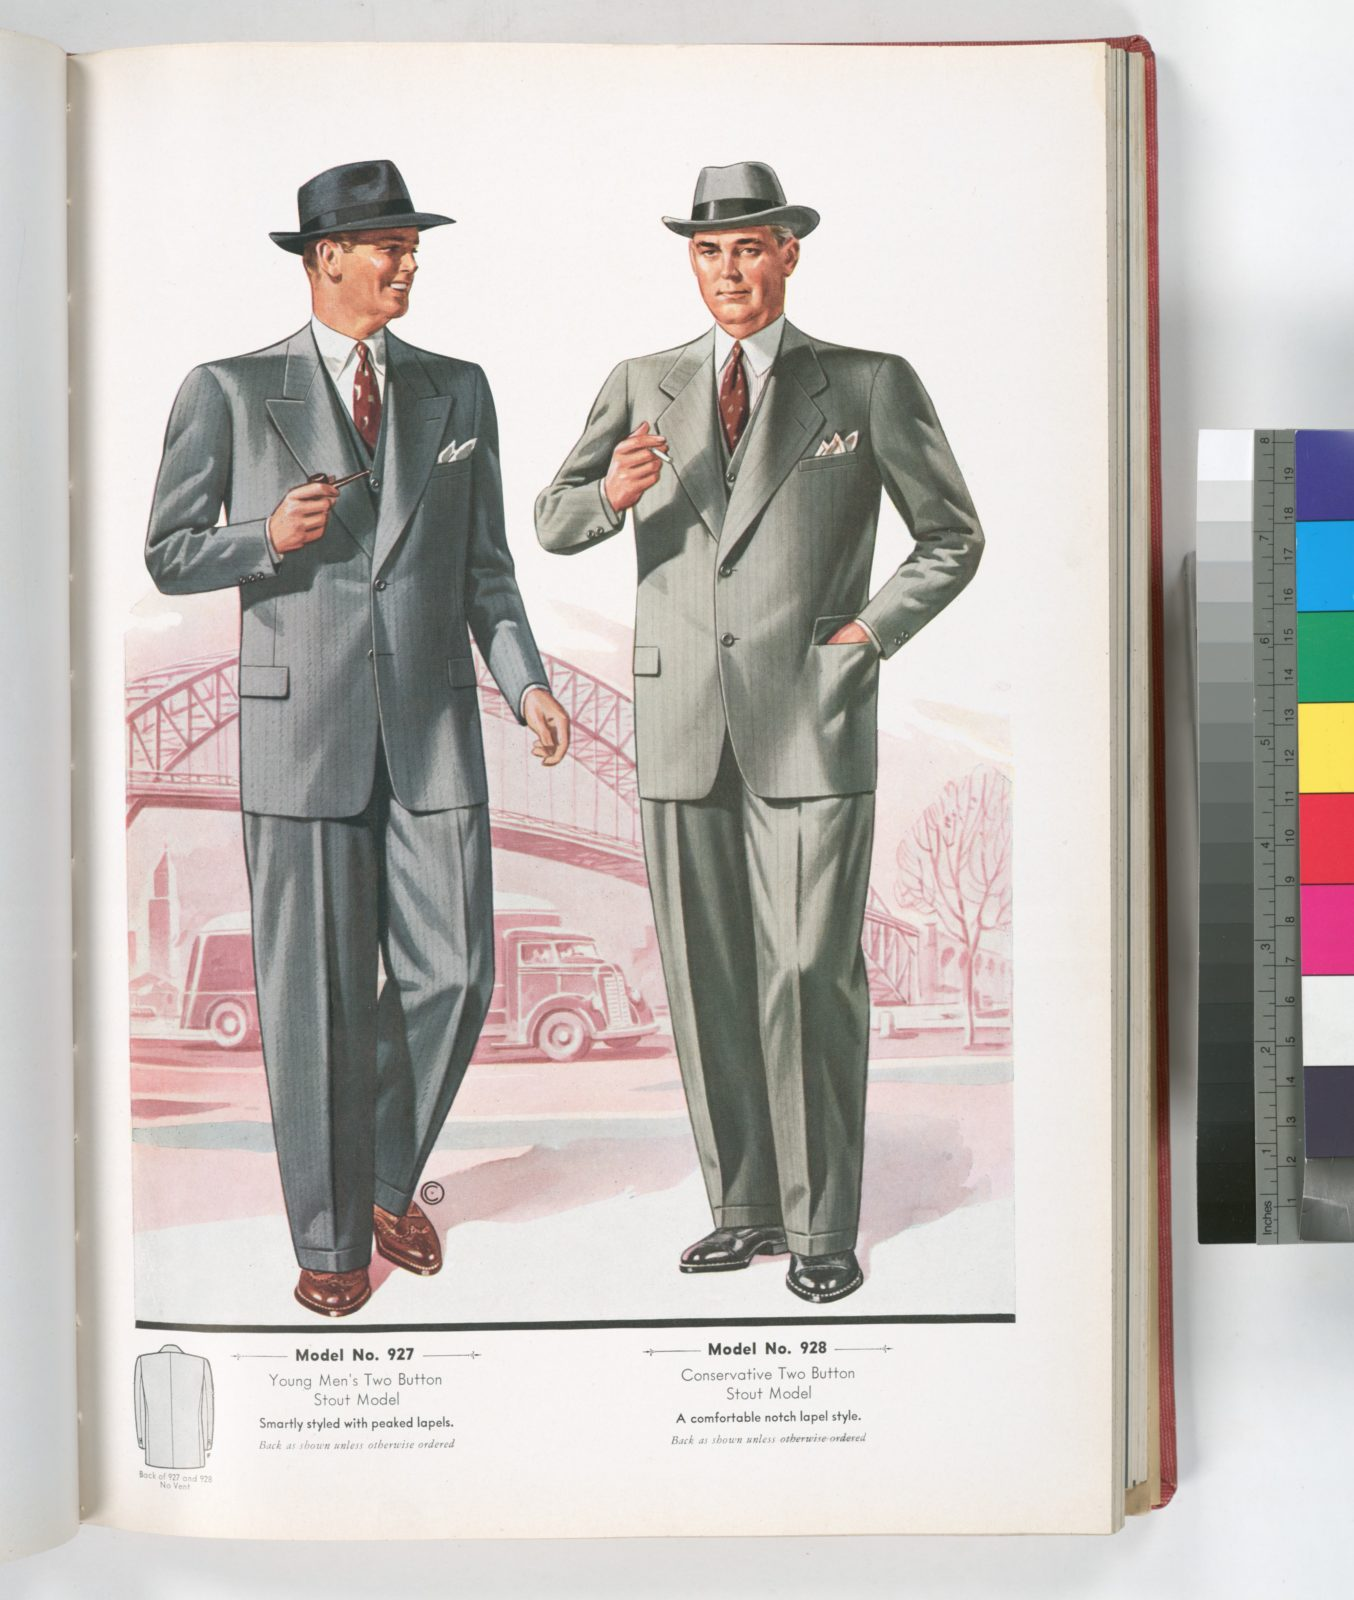 Model No. 927. Young men's two button stout model; Model No. 928. Conservative two button stout model.